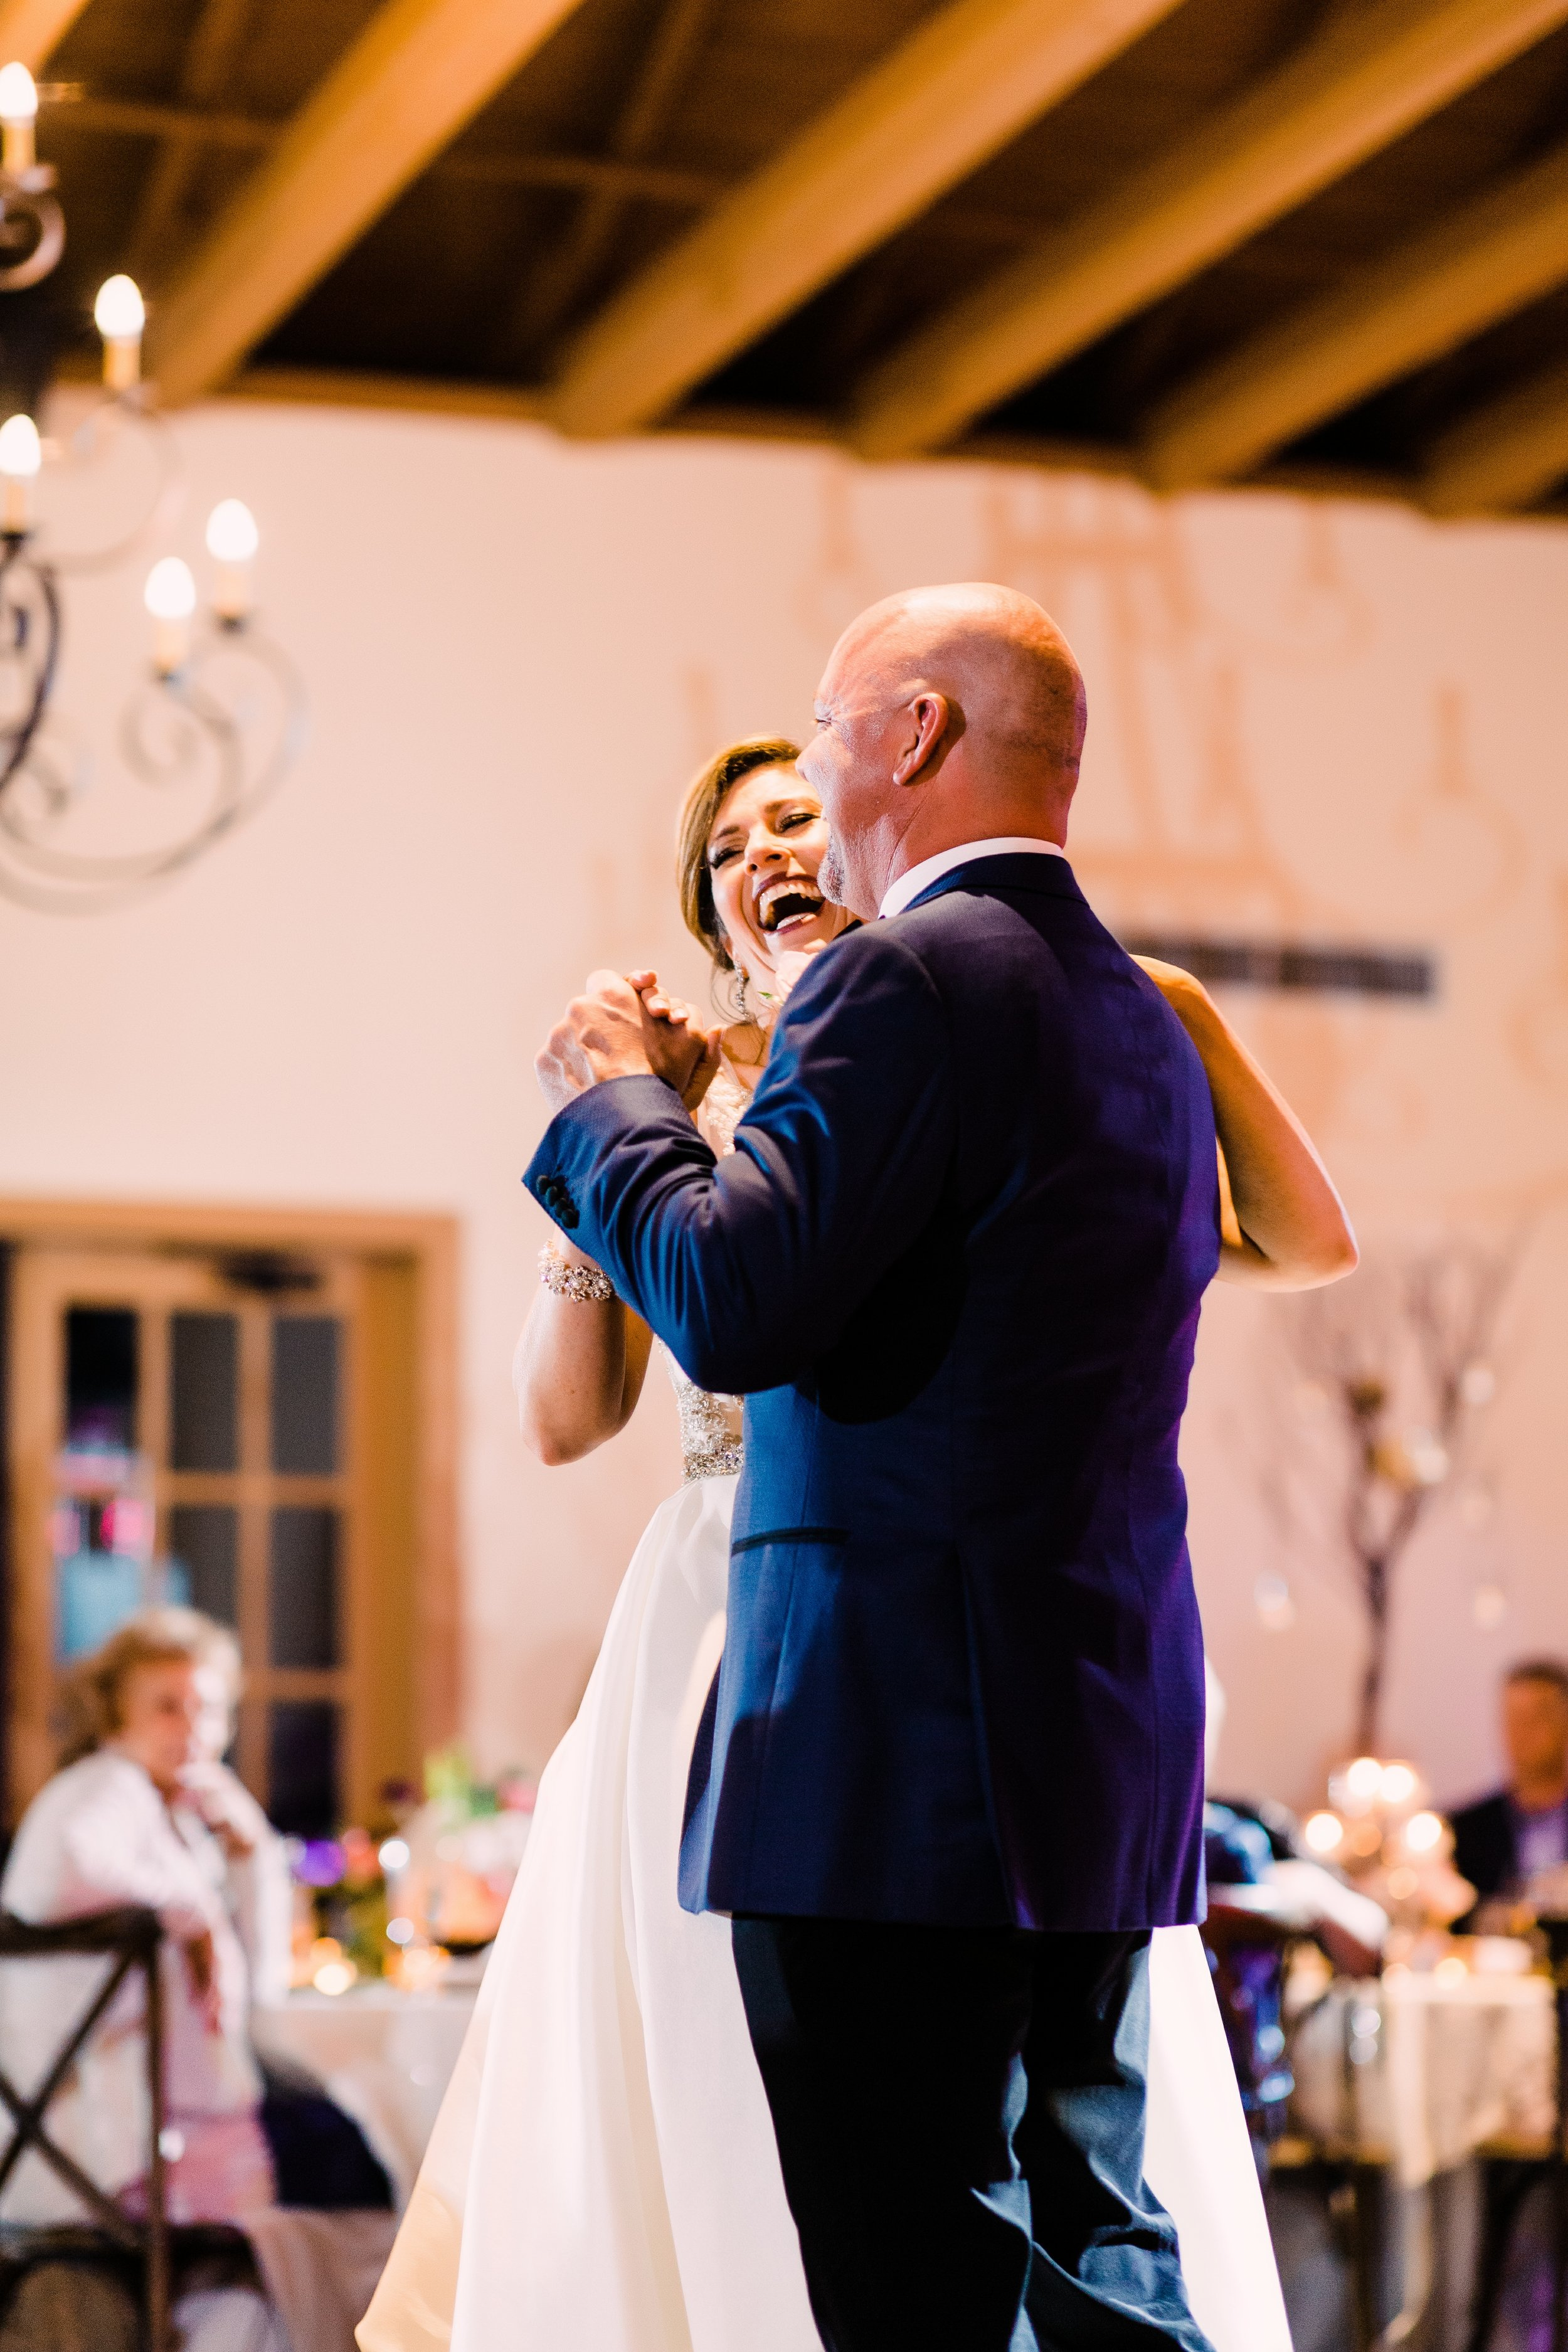 haehn-wedding-little-chapel-in-the-woods-denton-tx-lantana-golf-club-wedding-055.jpg